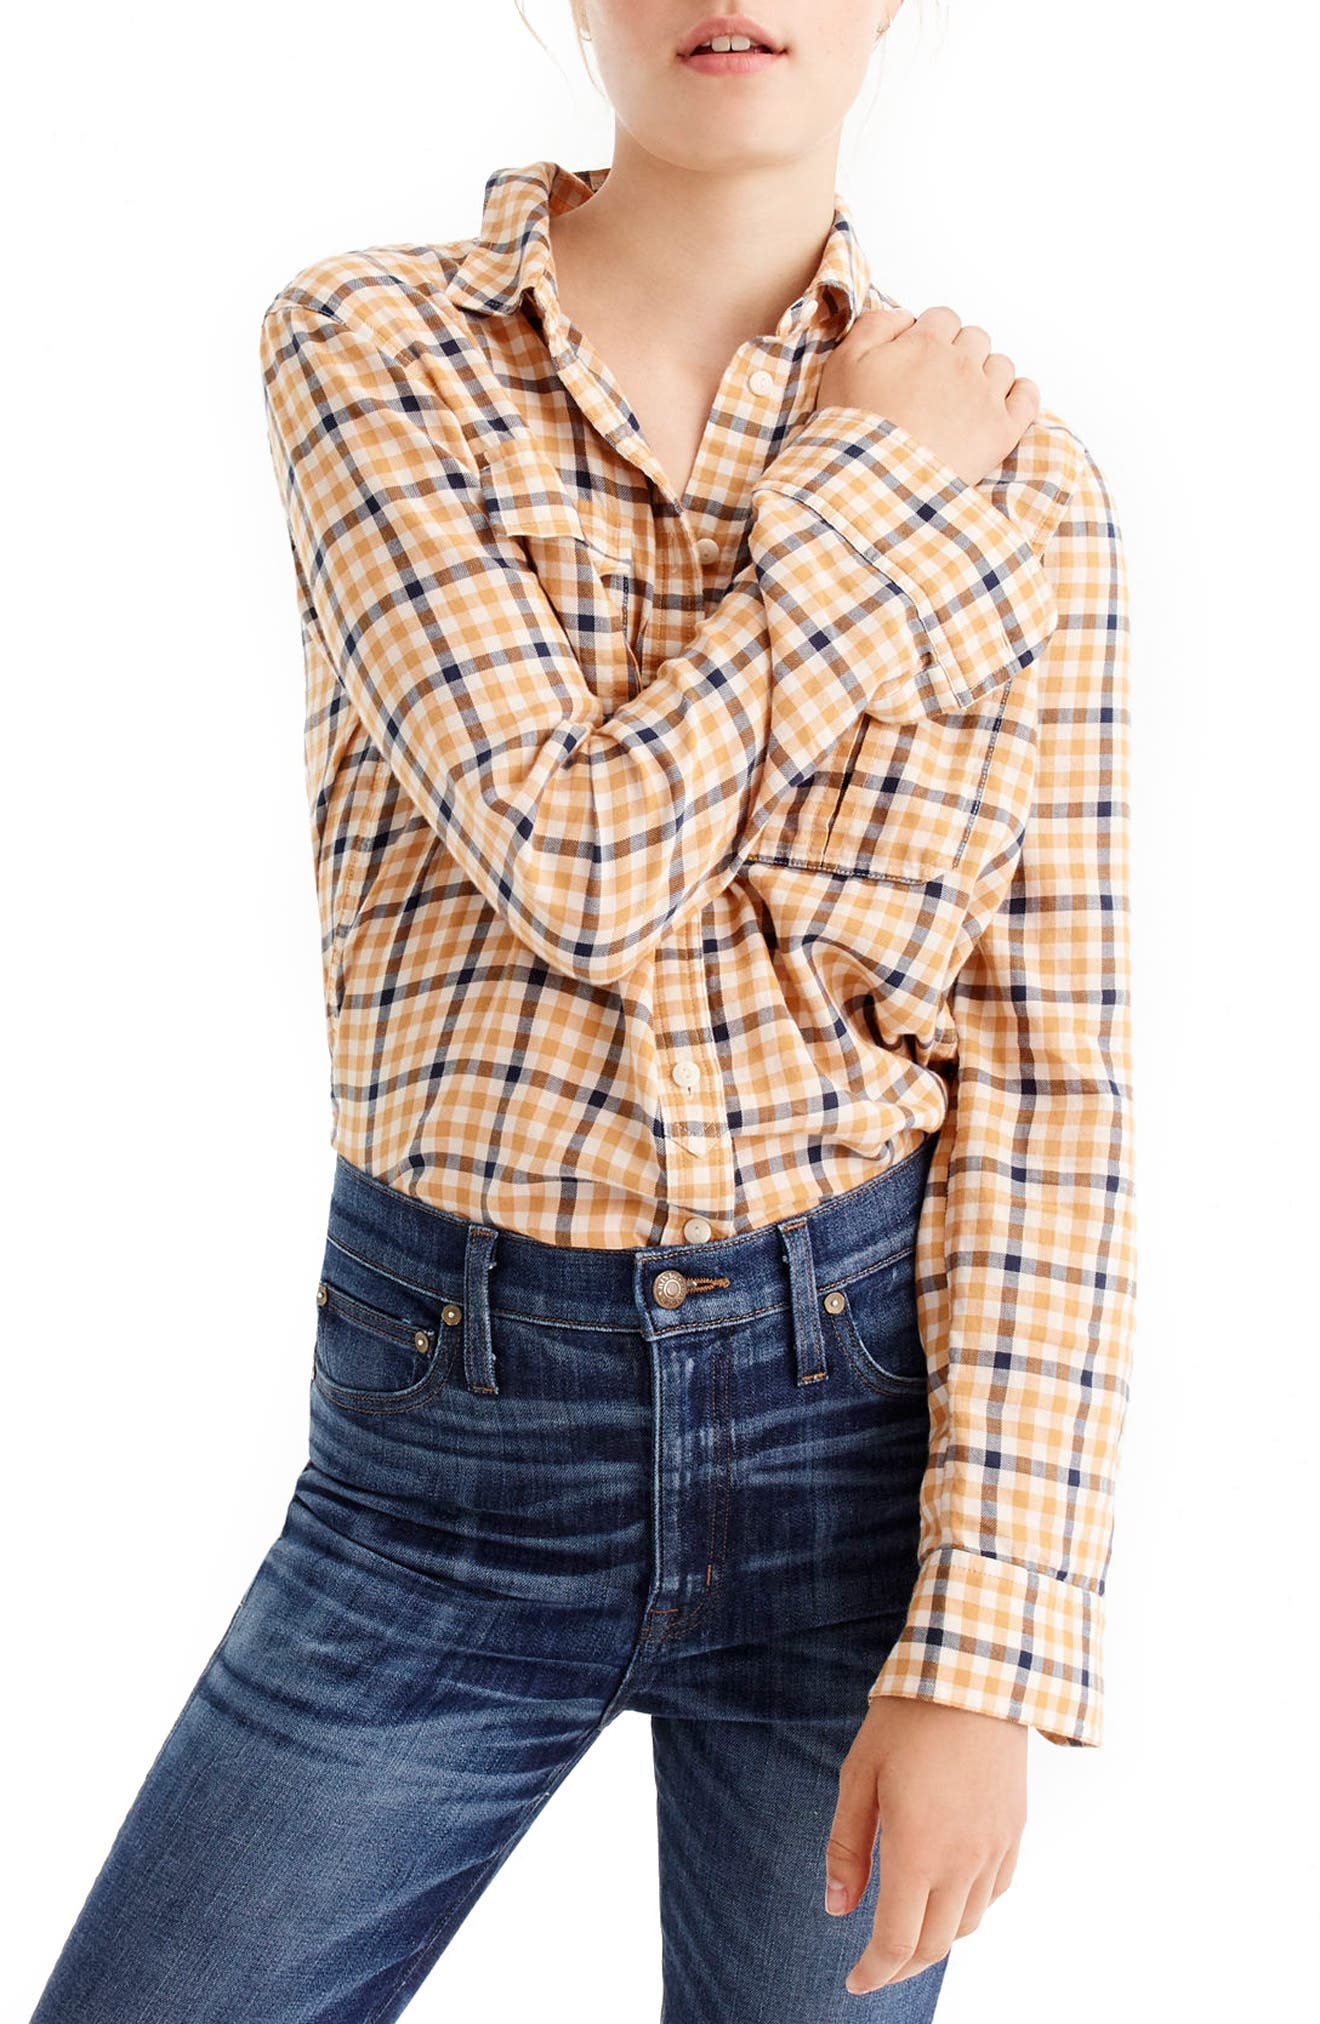 Main Image - J.Crew Topaz Plaid Boyfriend Shirt (Regular & Petite)